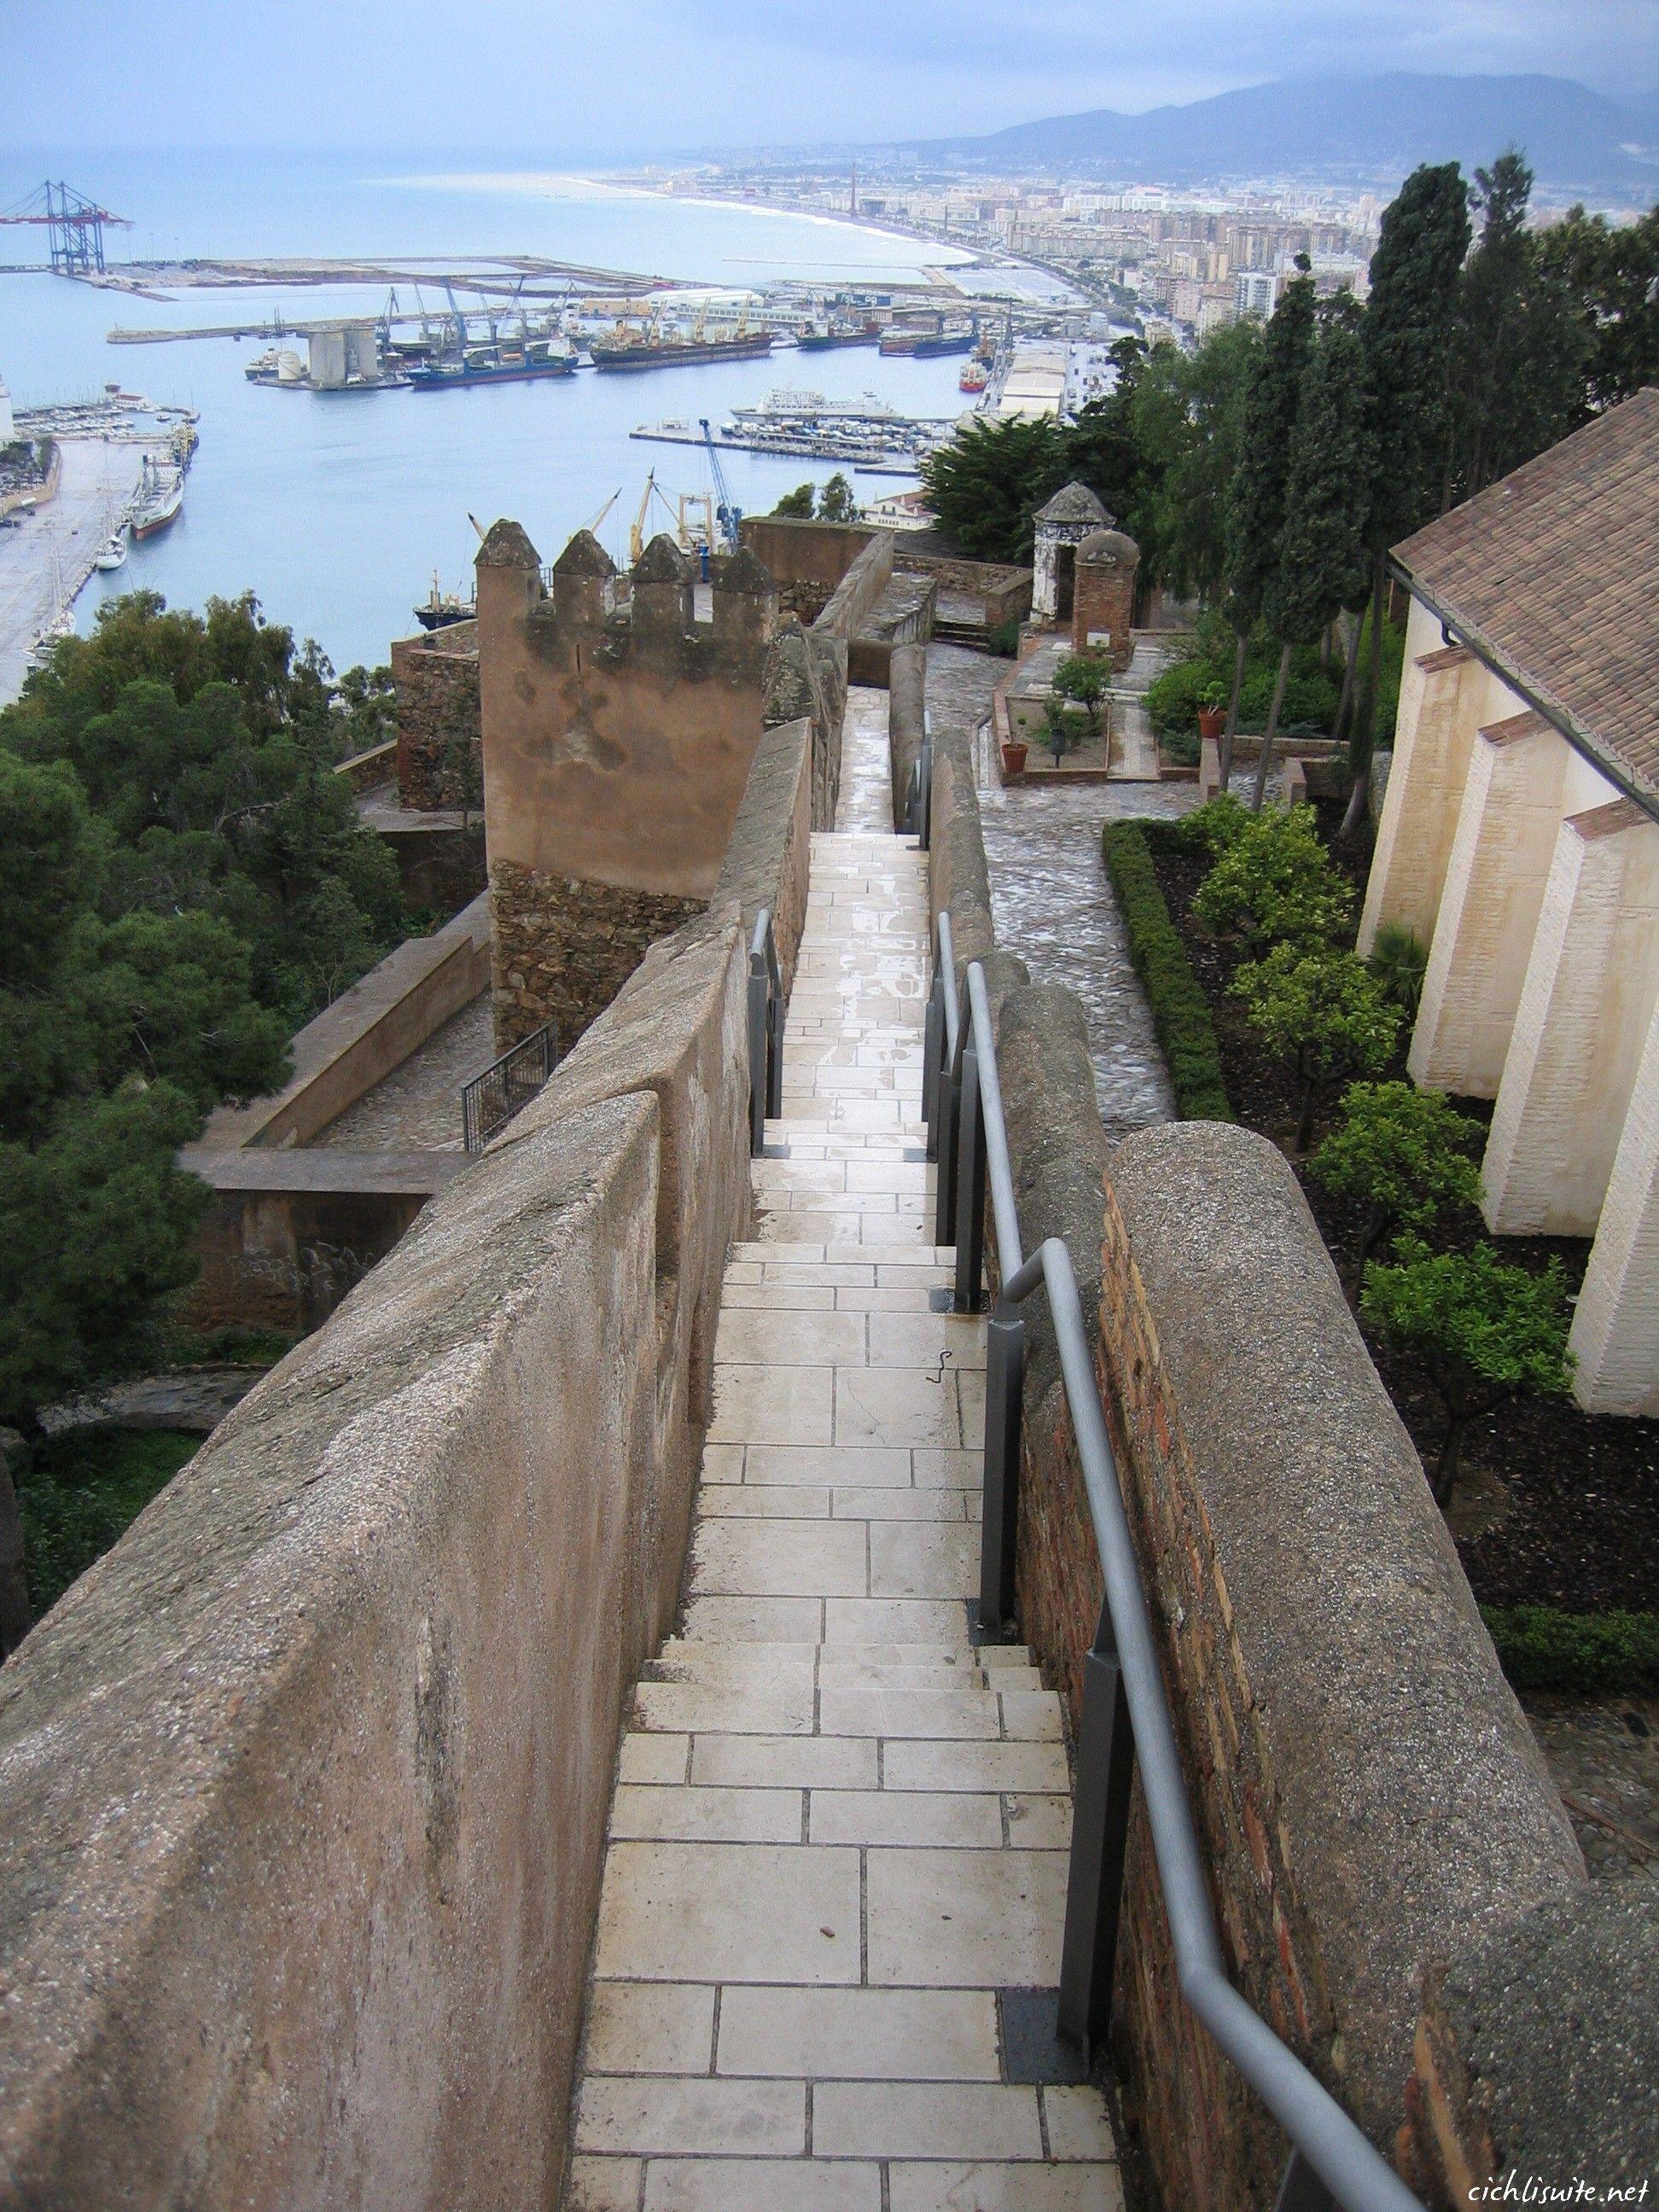 Malaga, Spain. Our tips for things to do in Malaga: http://www.europealacarte.co.uk/blog/2010/08/22/malaga-travel-tips-best-things-to-do-in-malaga/